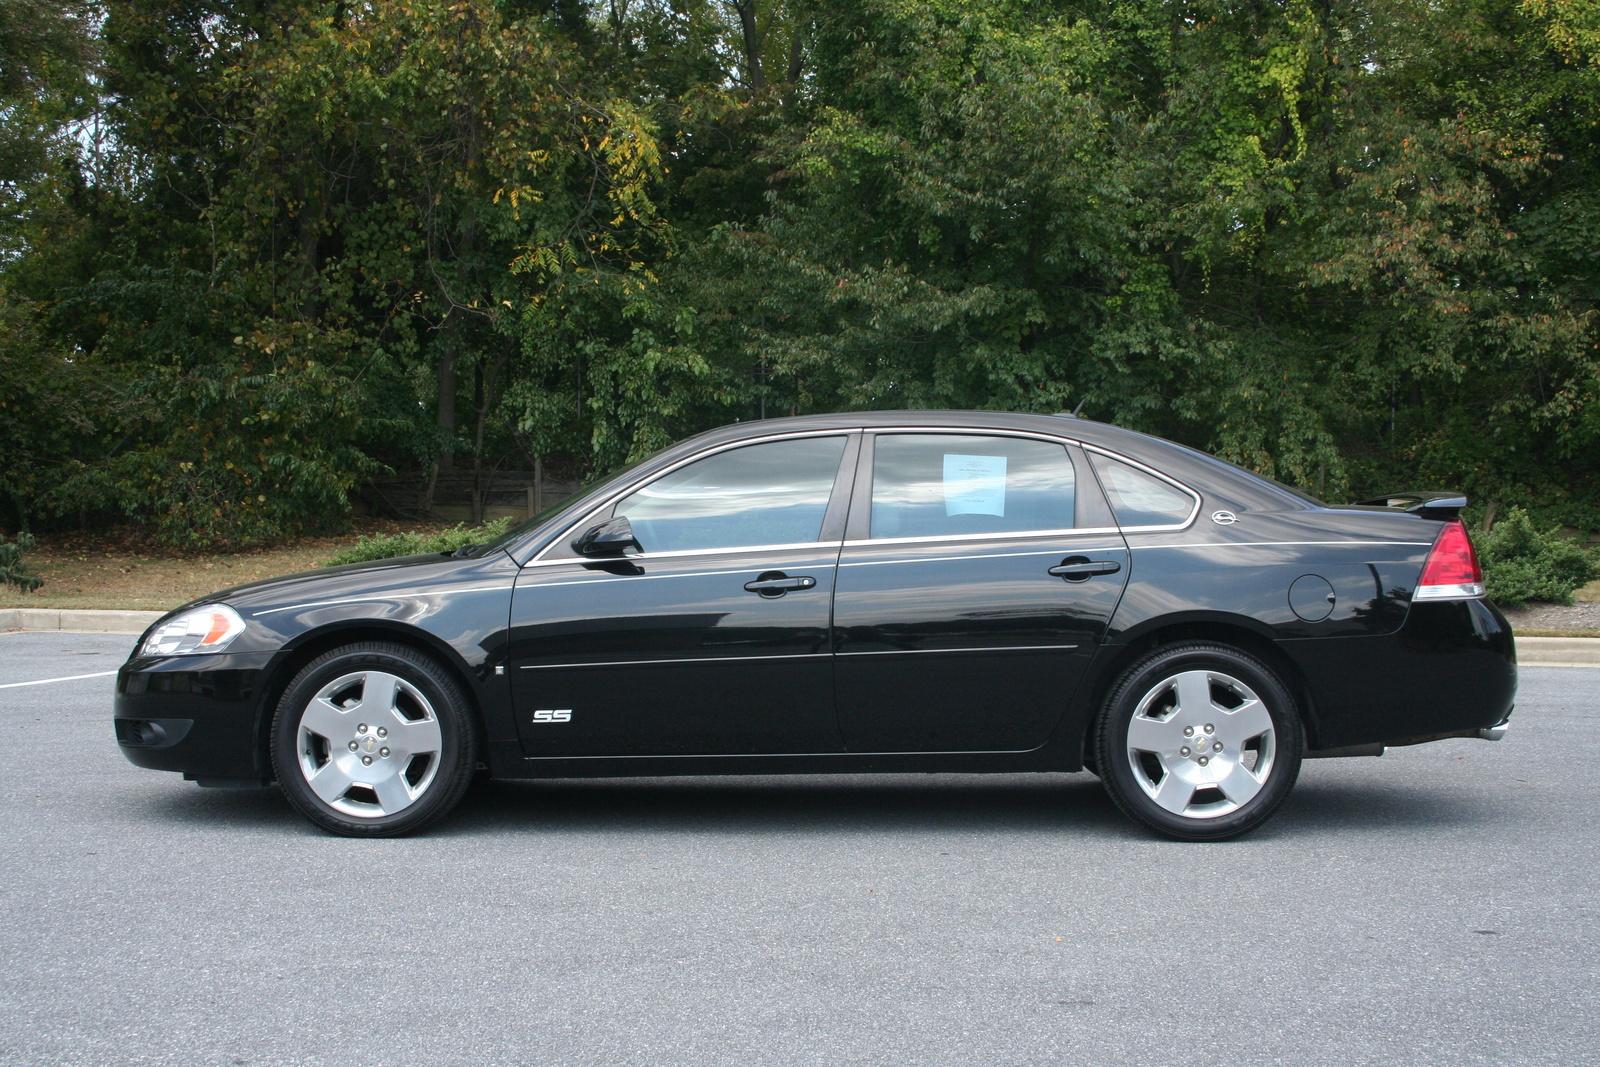 Used 2008 chevrolet impala ltz sedan apps directories